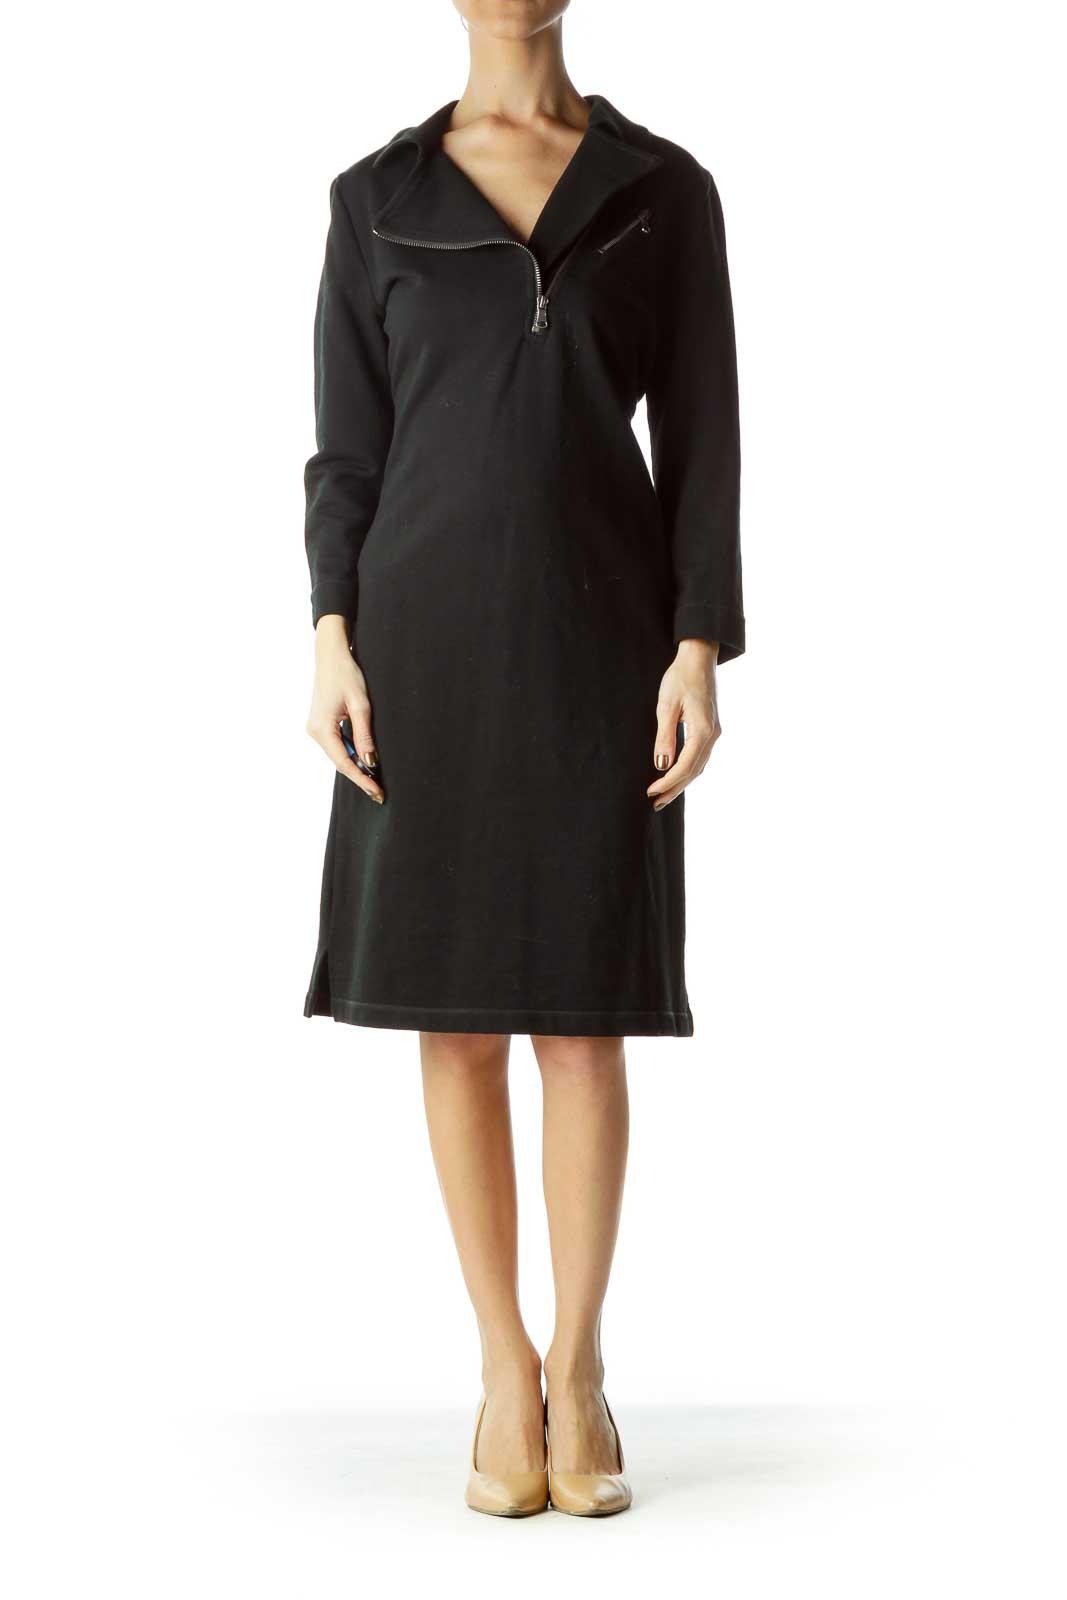 Black Zippered Sweatshirt Dress